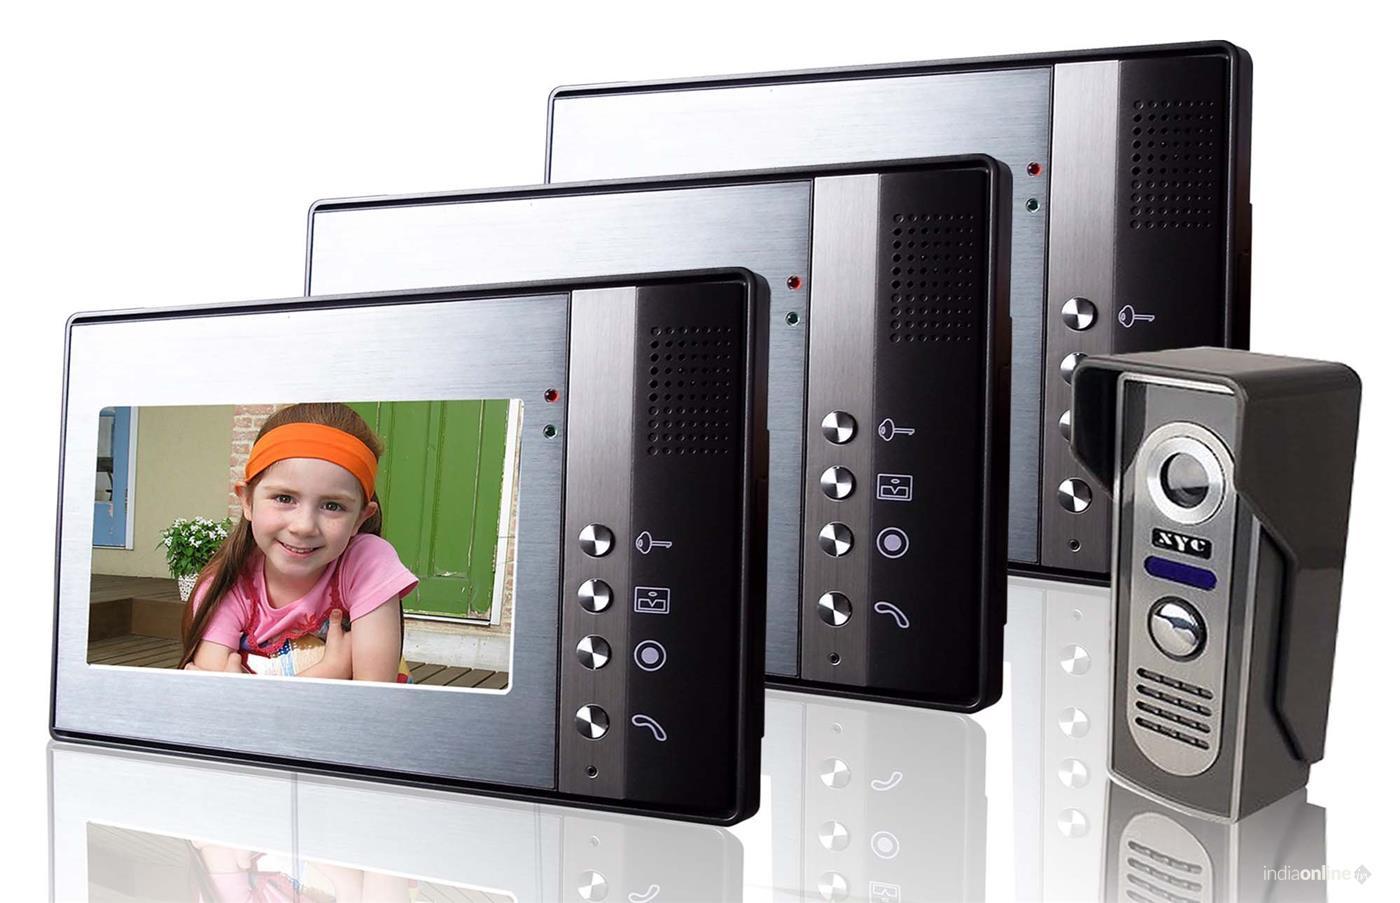 video door phone  sc 1 st  Mangalam Internet Services & Video Door Phones by Mangalam Internet Services - Photos Price \u0026 Offers